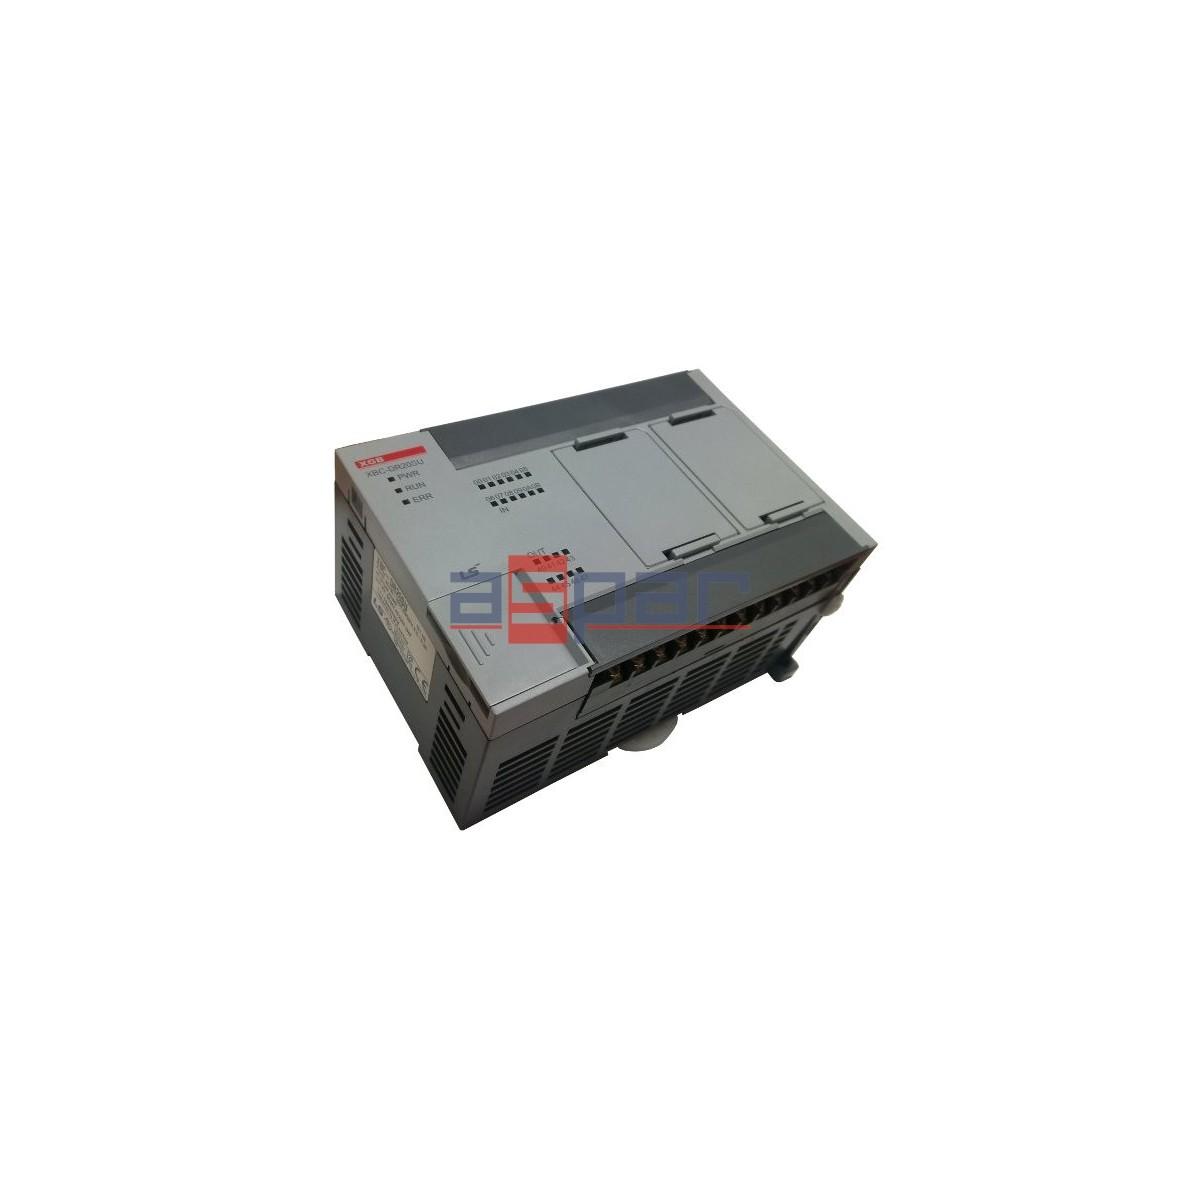 XBC-DR20SU - CPU 12 I/8 O przekaźnik